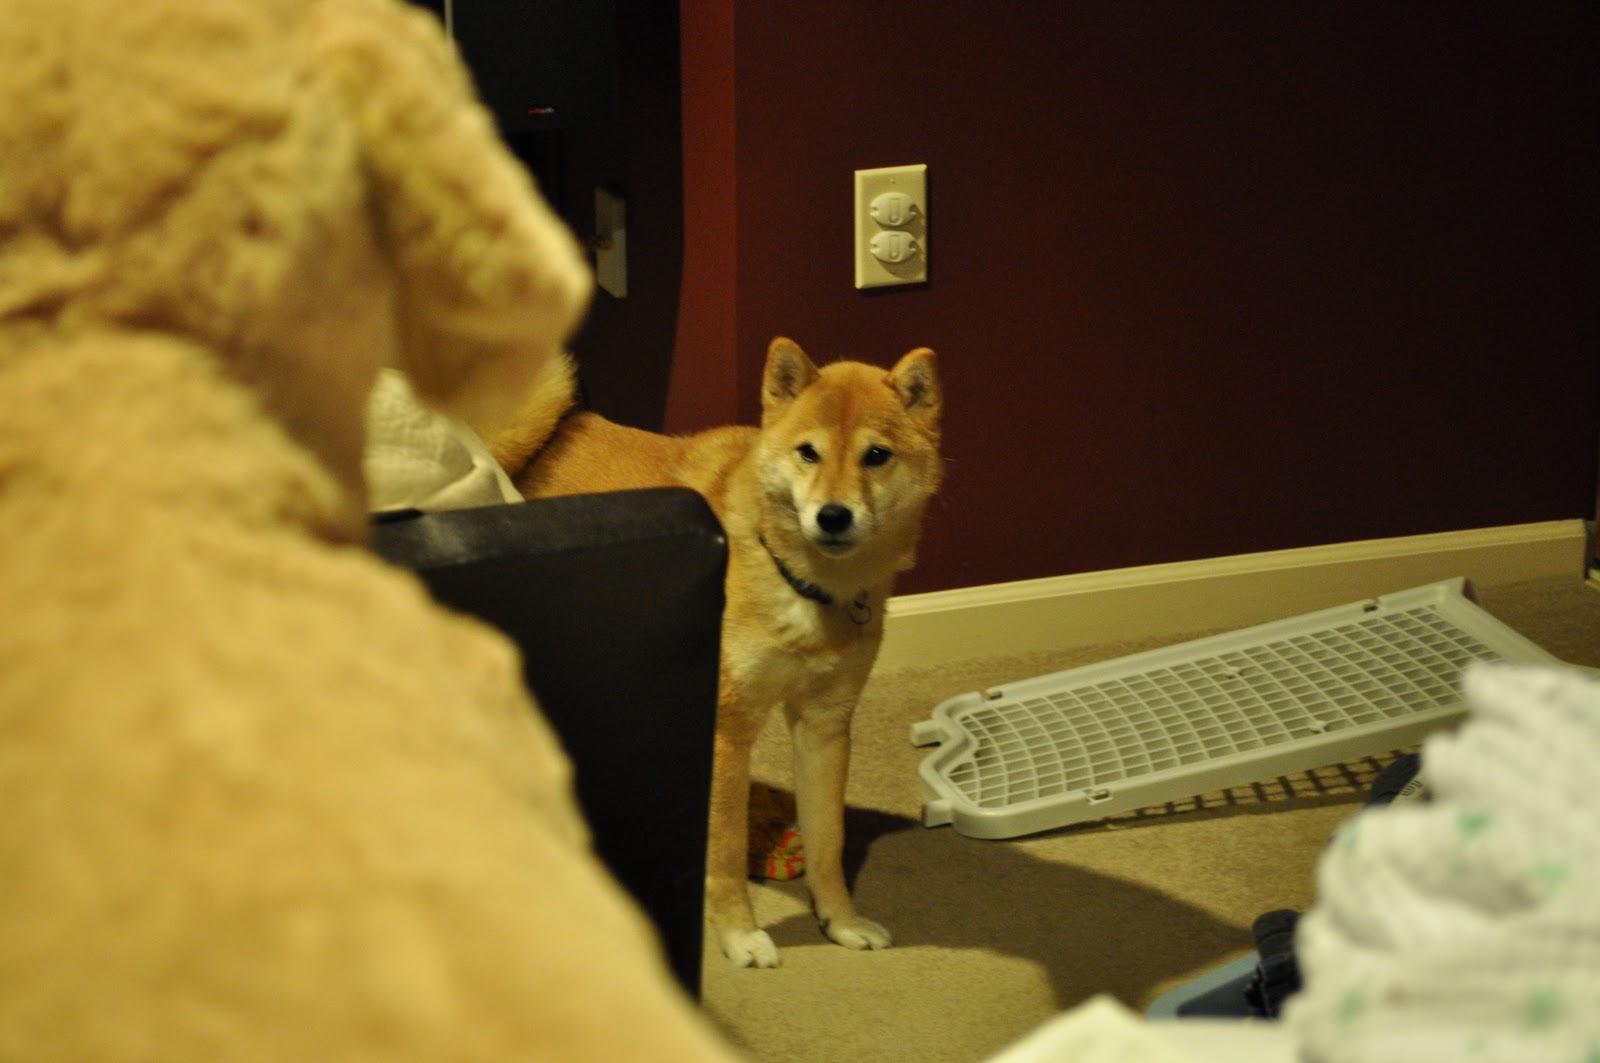 Intruder Barking Dog Alarm Uk Tyne